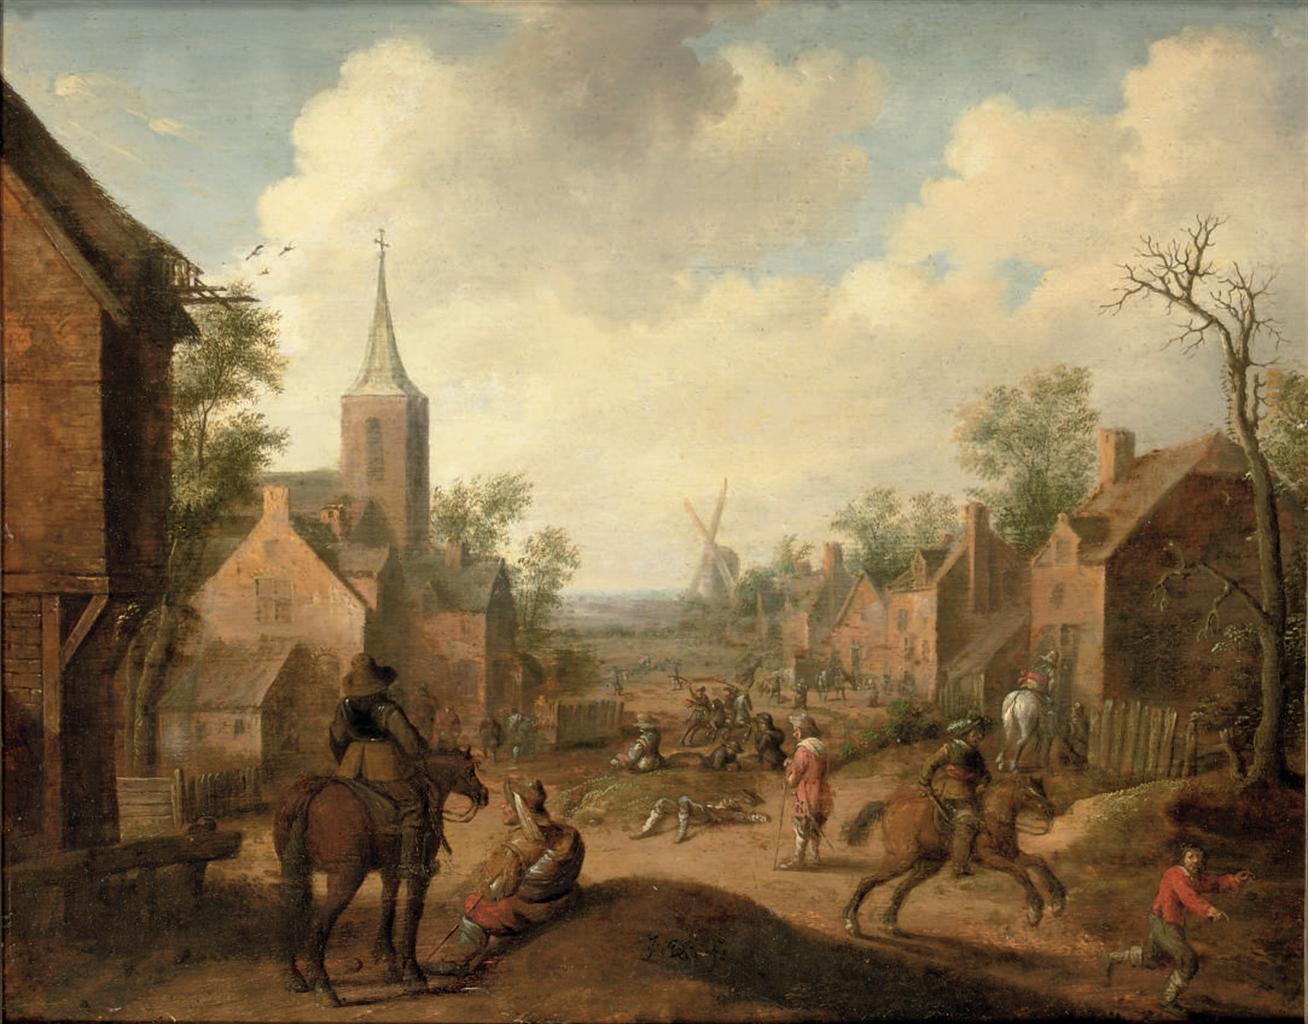 Soldiers plundering a village, by Joost Cornelisz Droochsloot